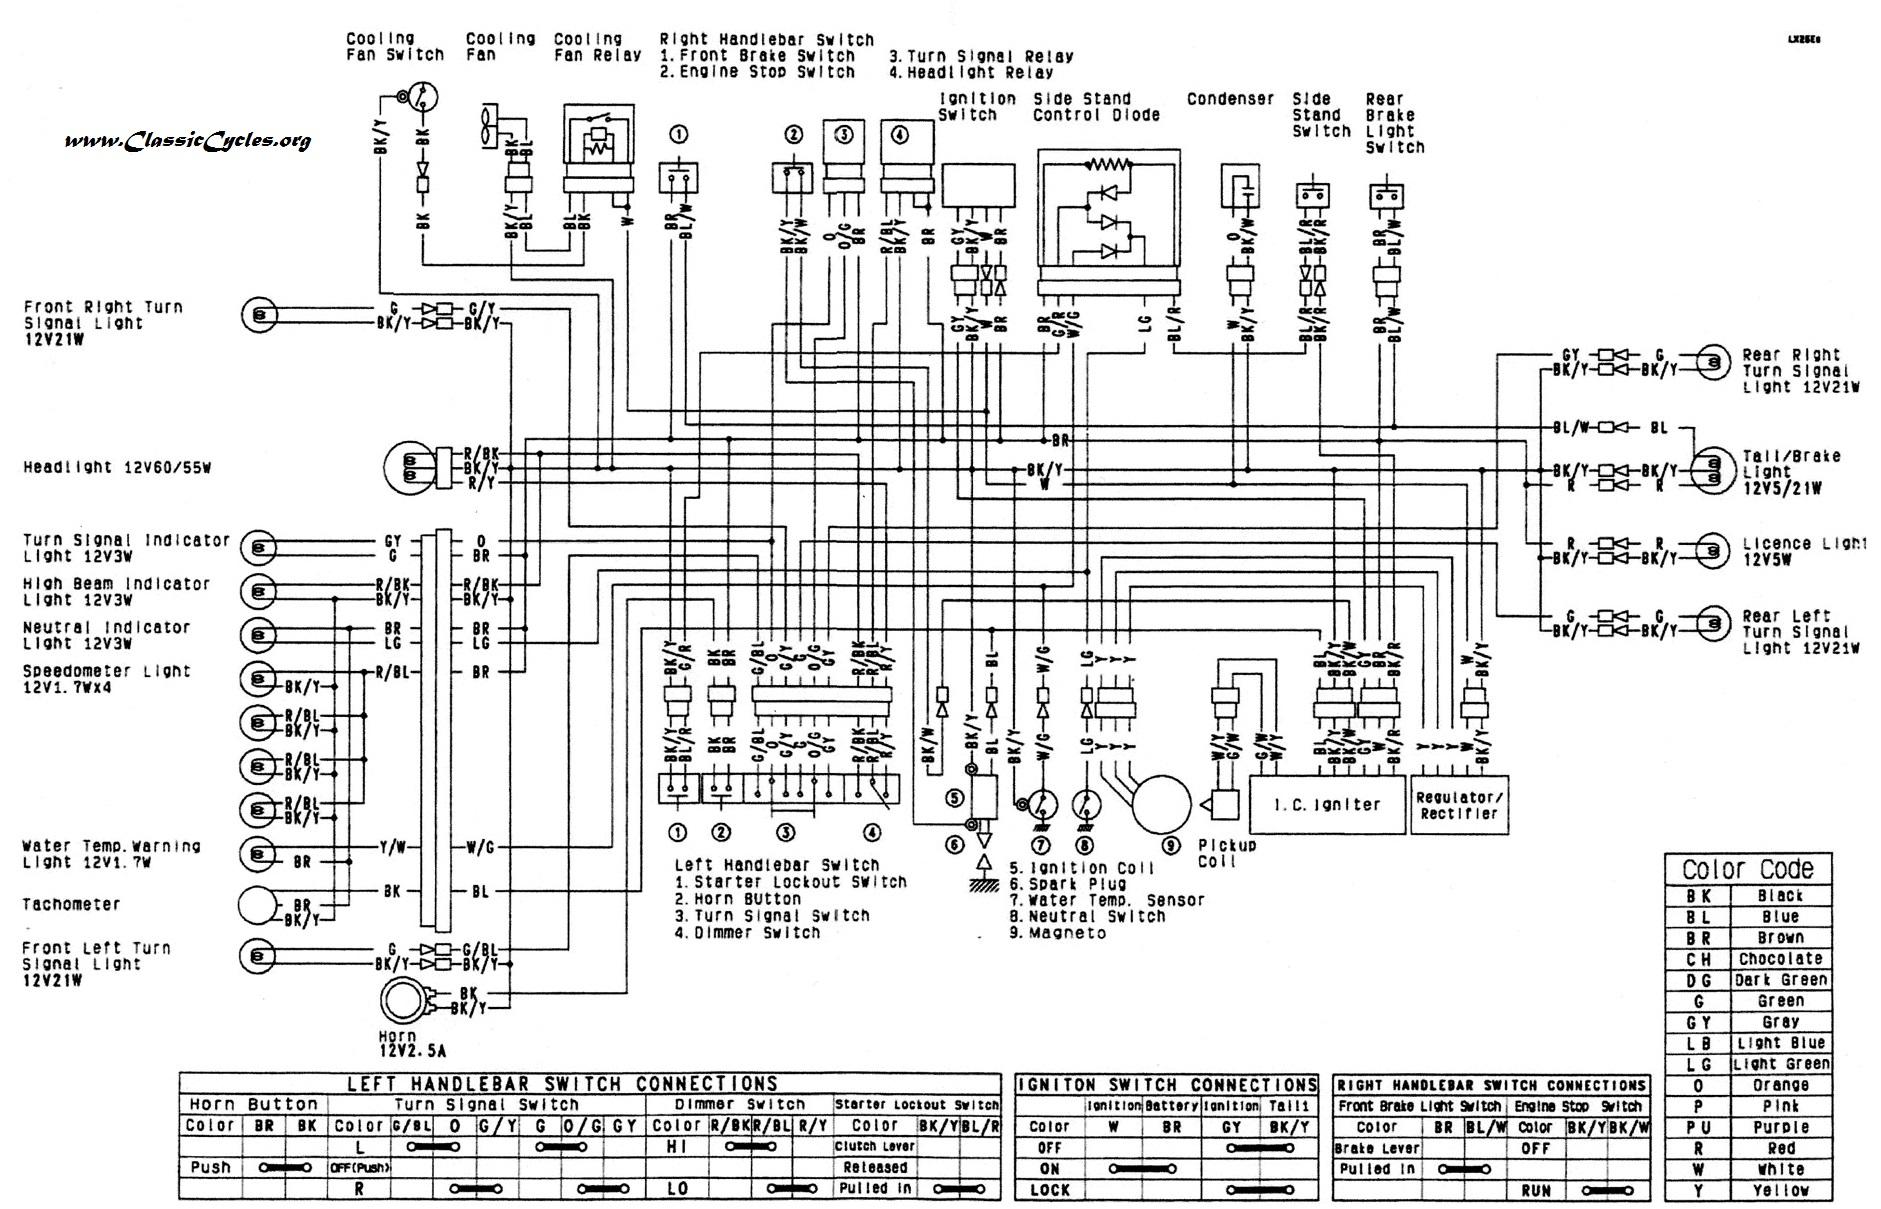 Fz Honda Rc51 Wiring Diagram Wiring Diagram